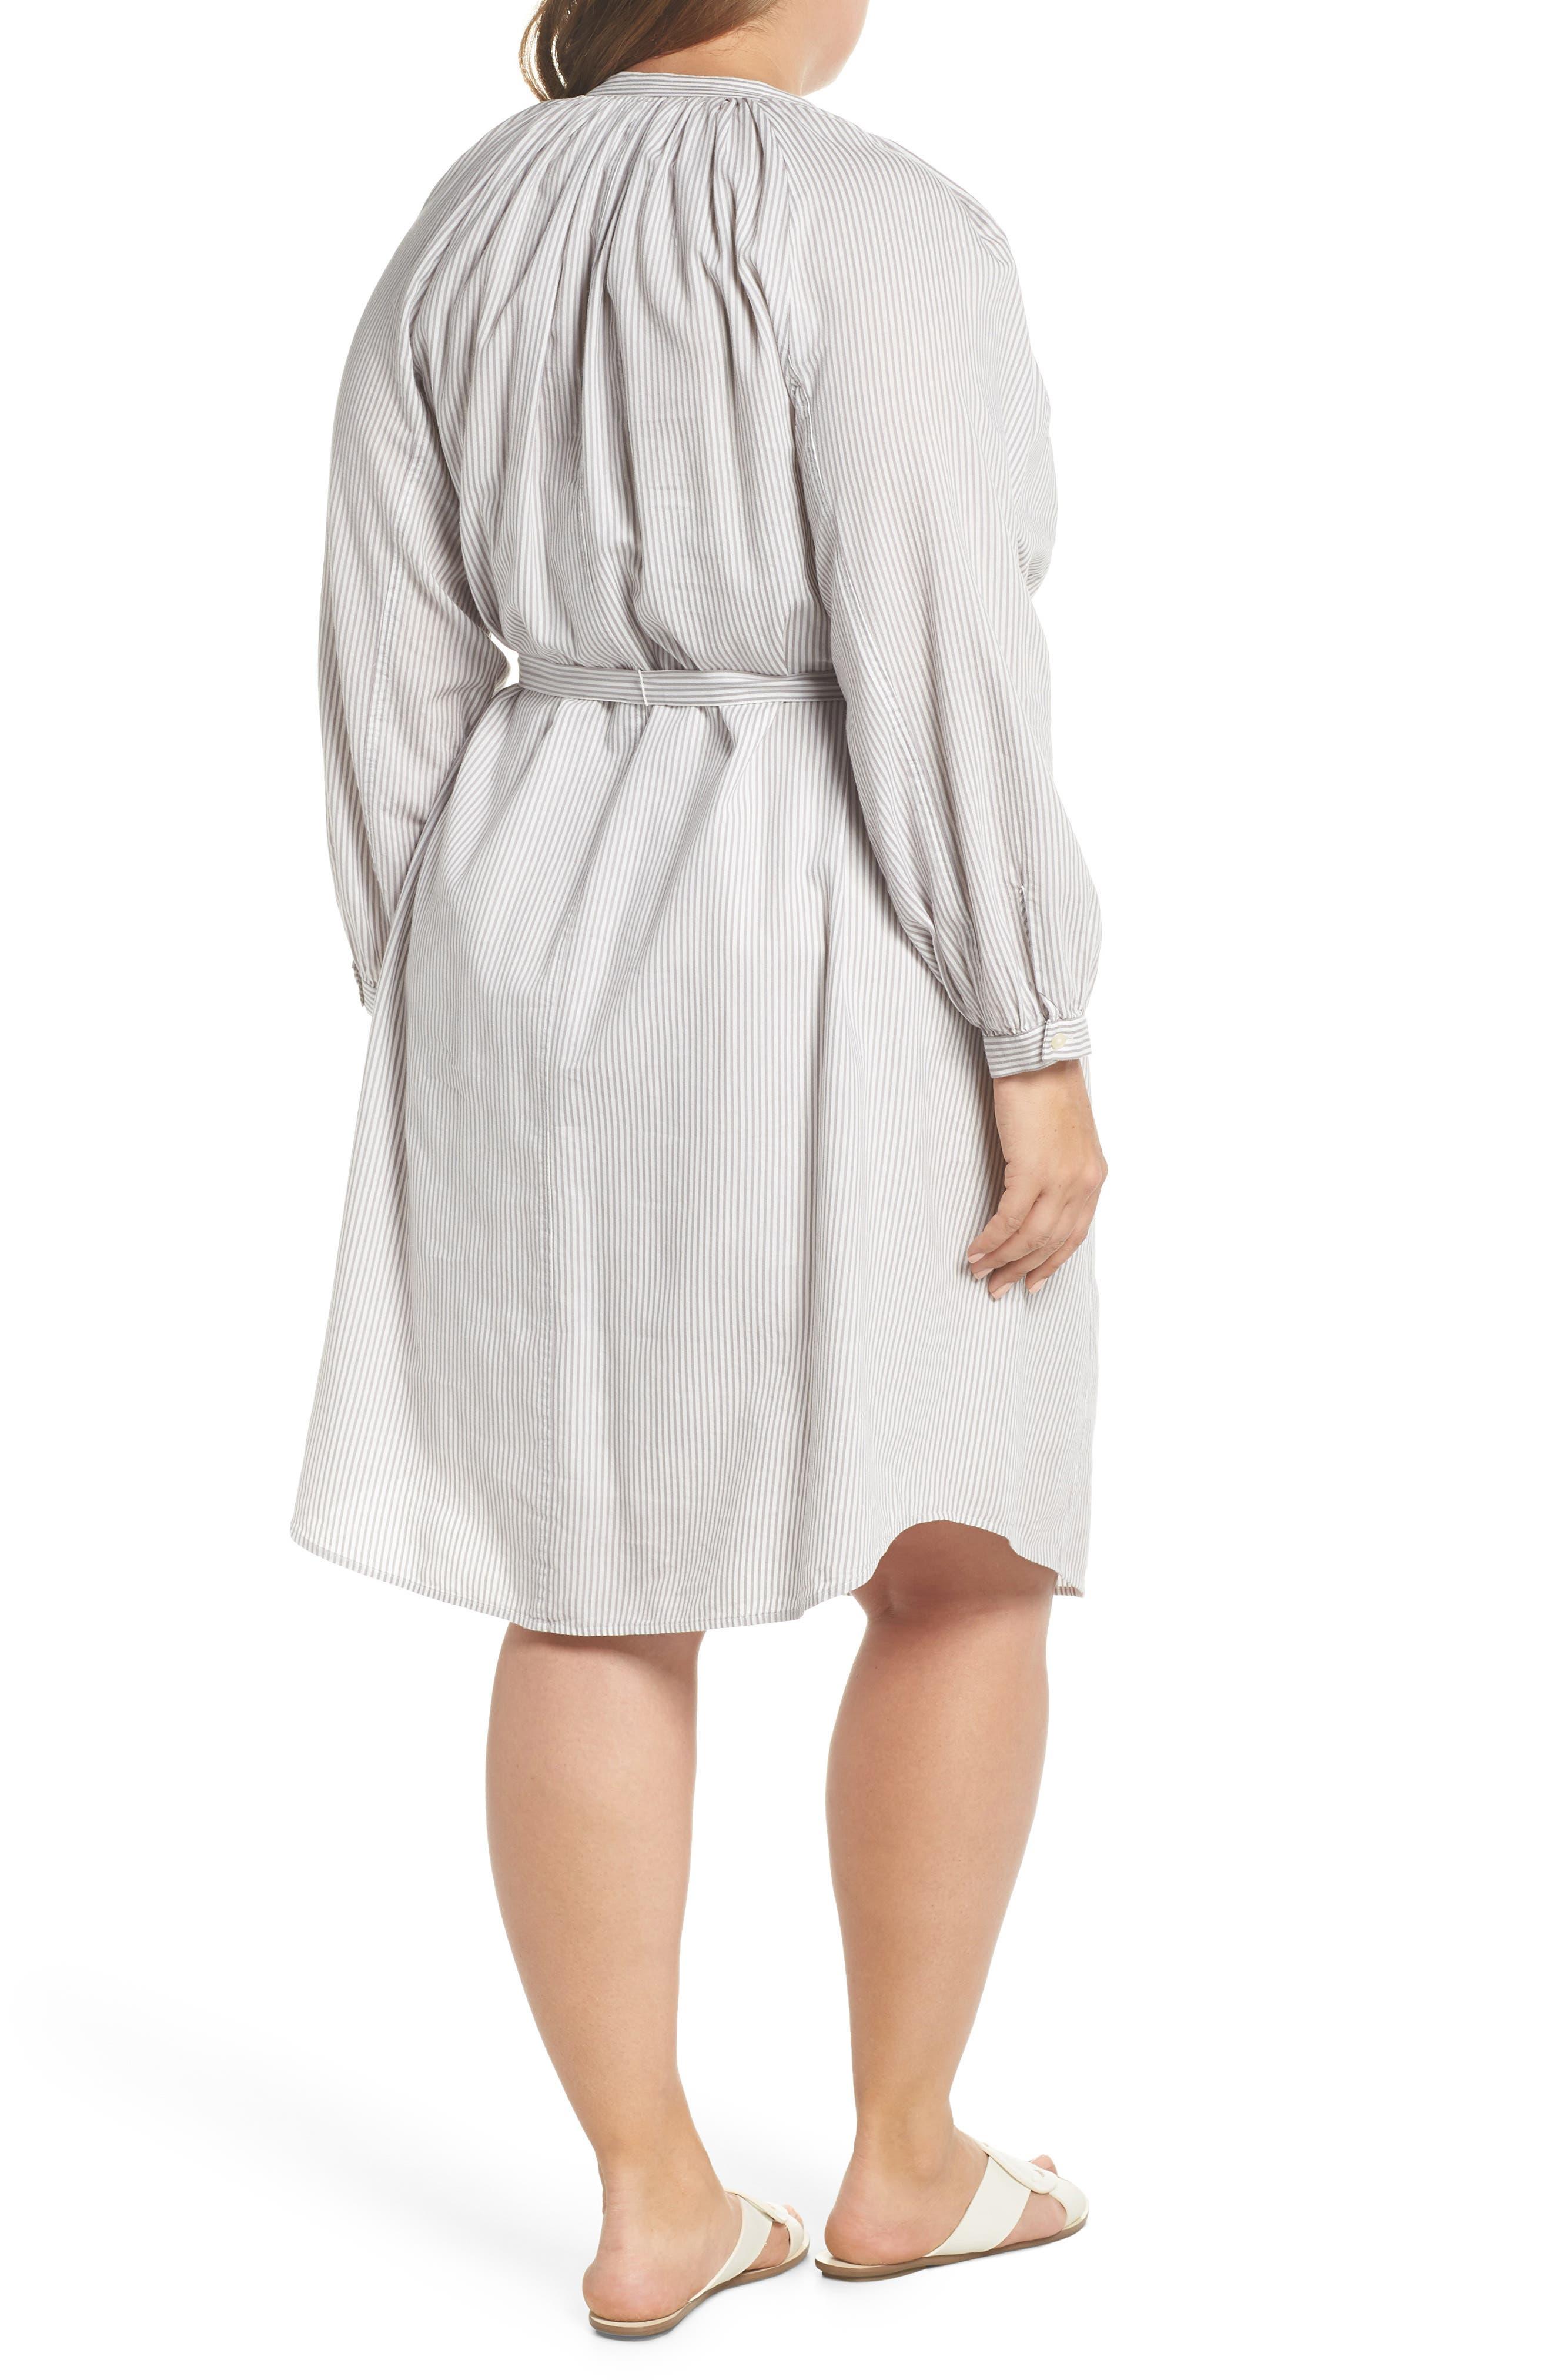 Stripe Peasant Dress,                             Alternate thumbnail 2, color,                             Grey Multi